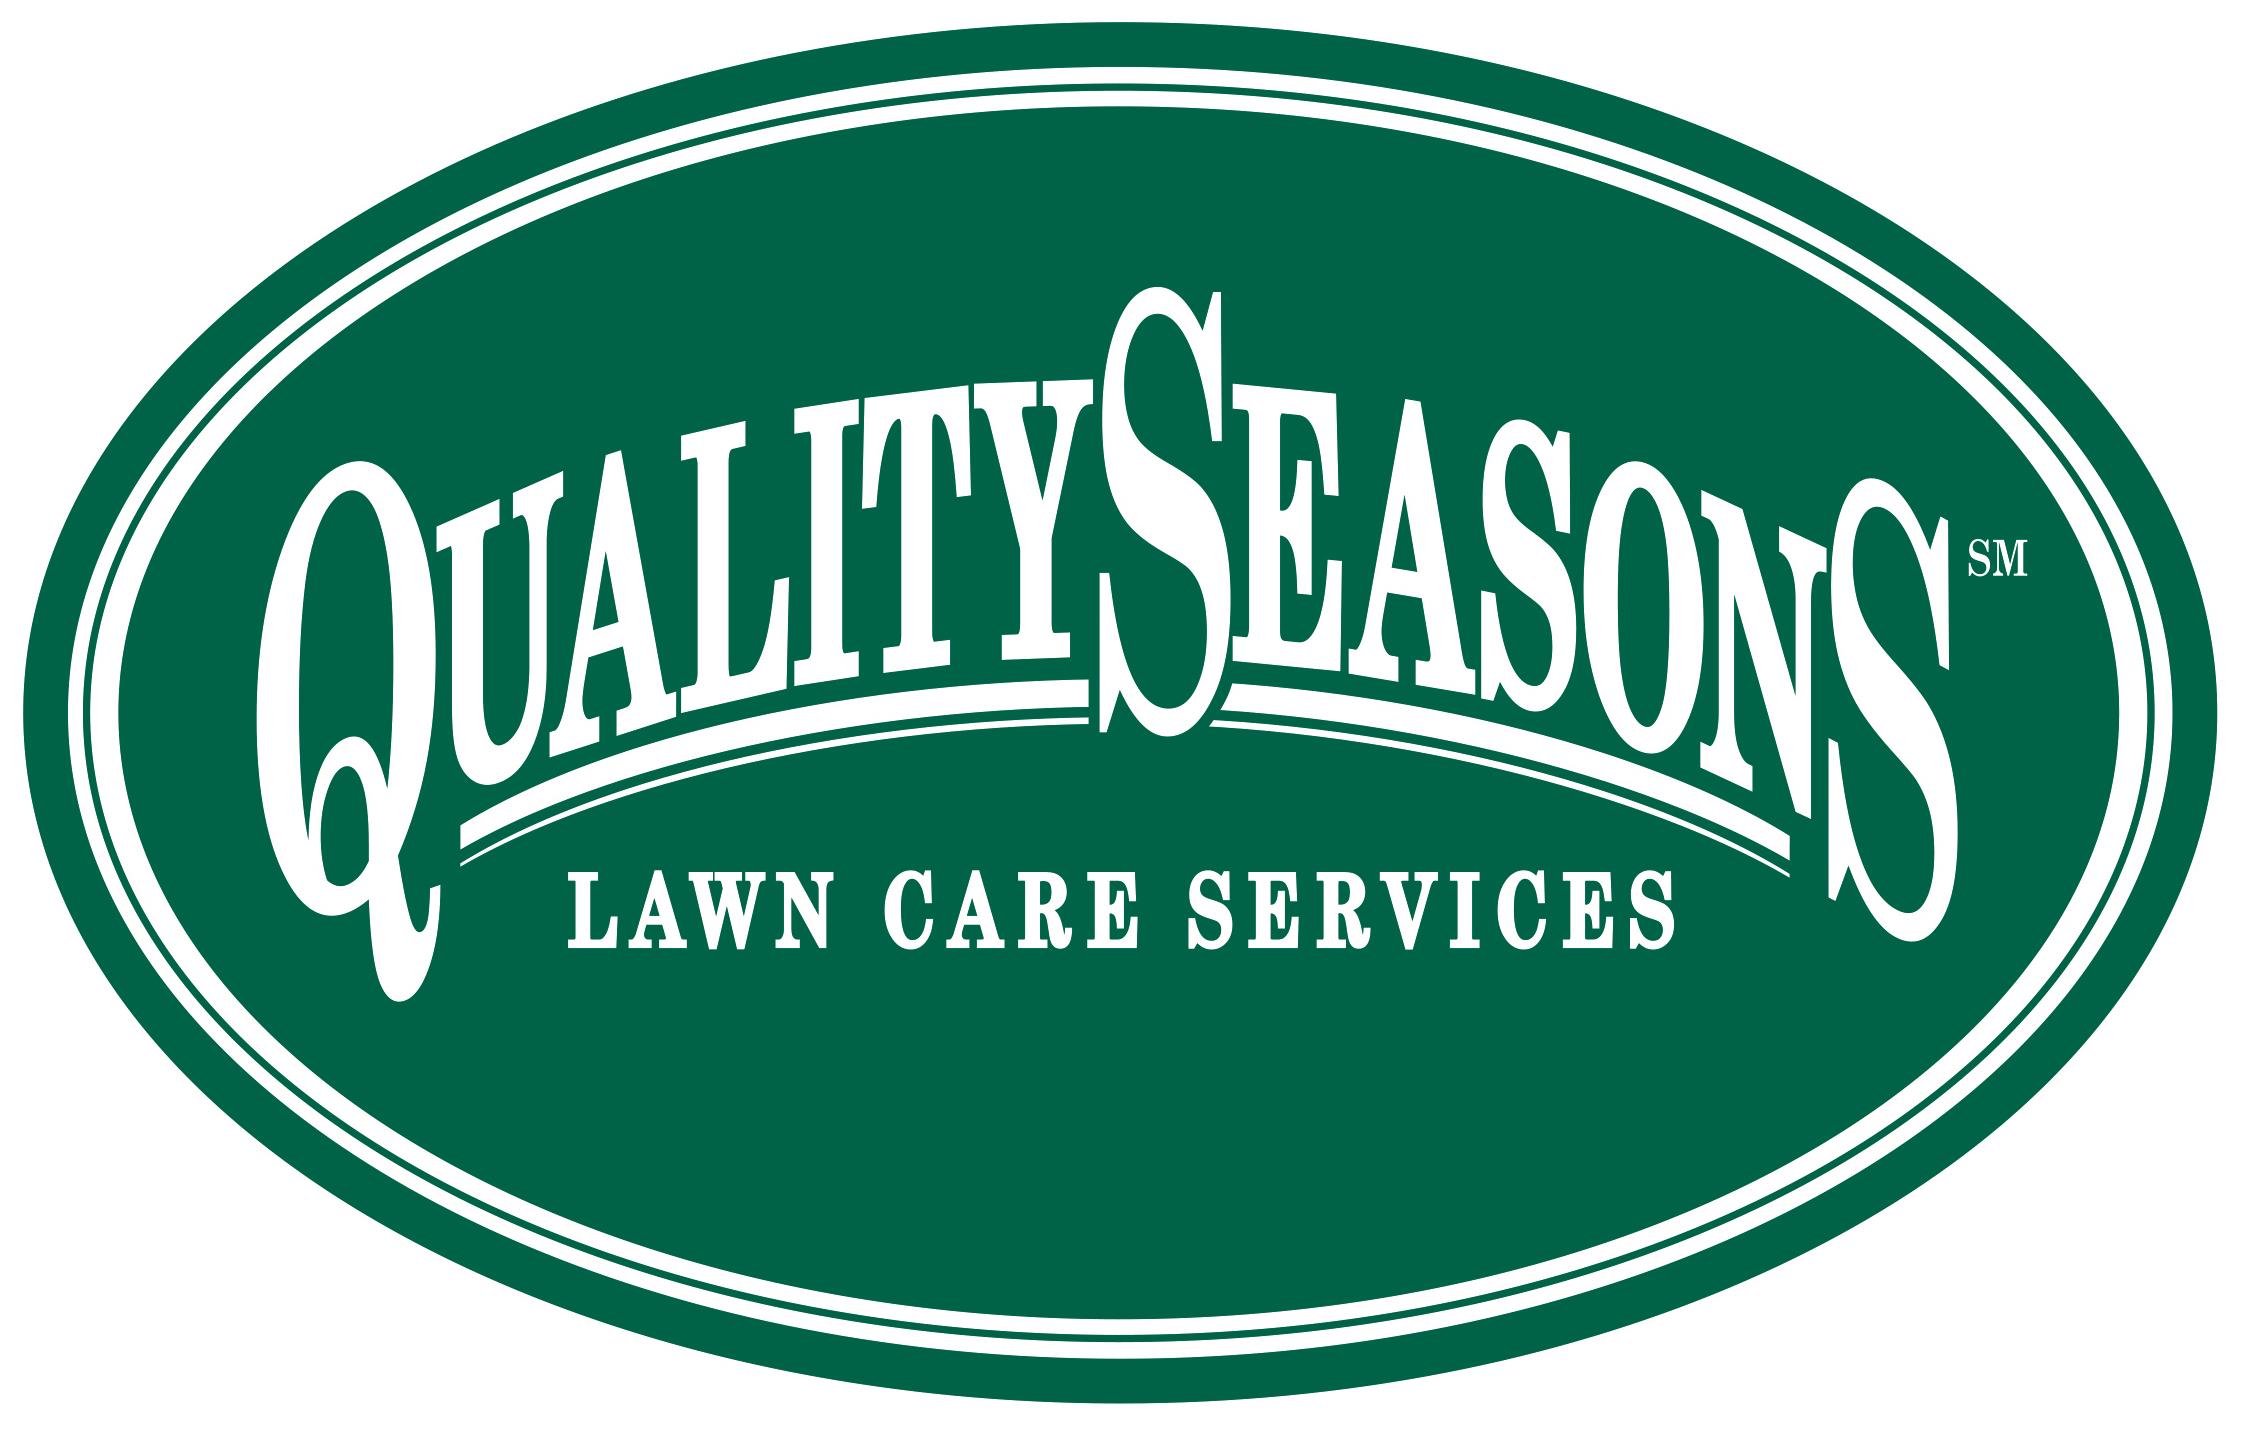 QS-Oval-Logo-without-Tagline.jpg